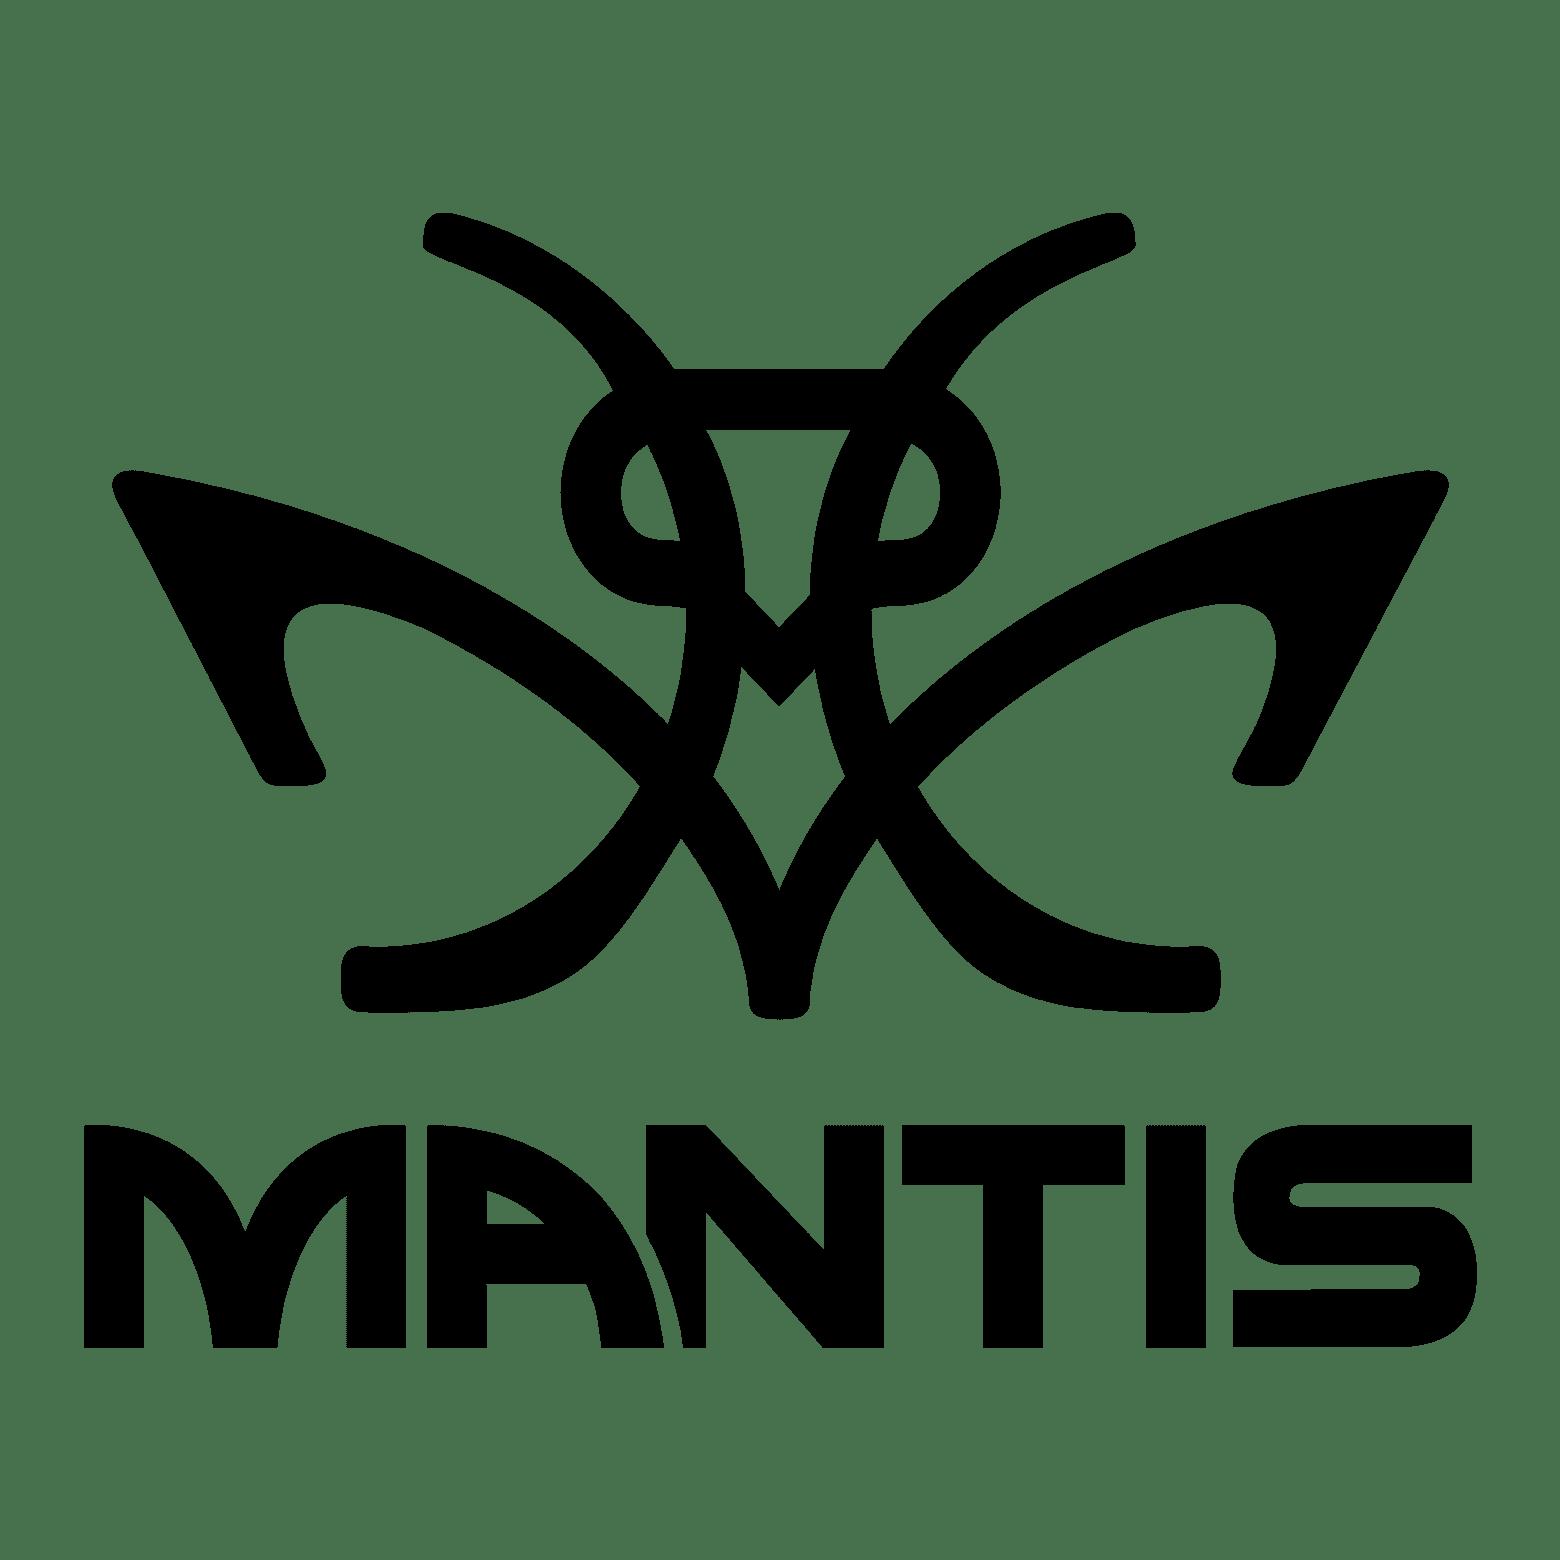 Coastside Media Mantis Logo